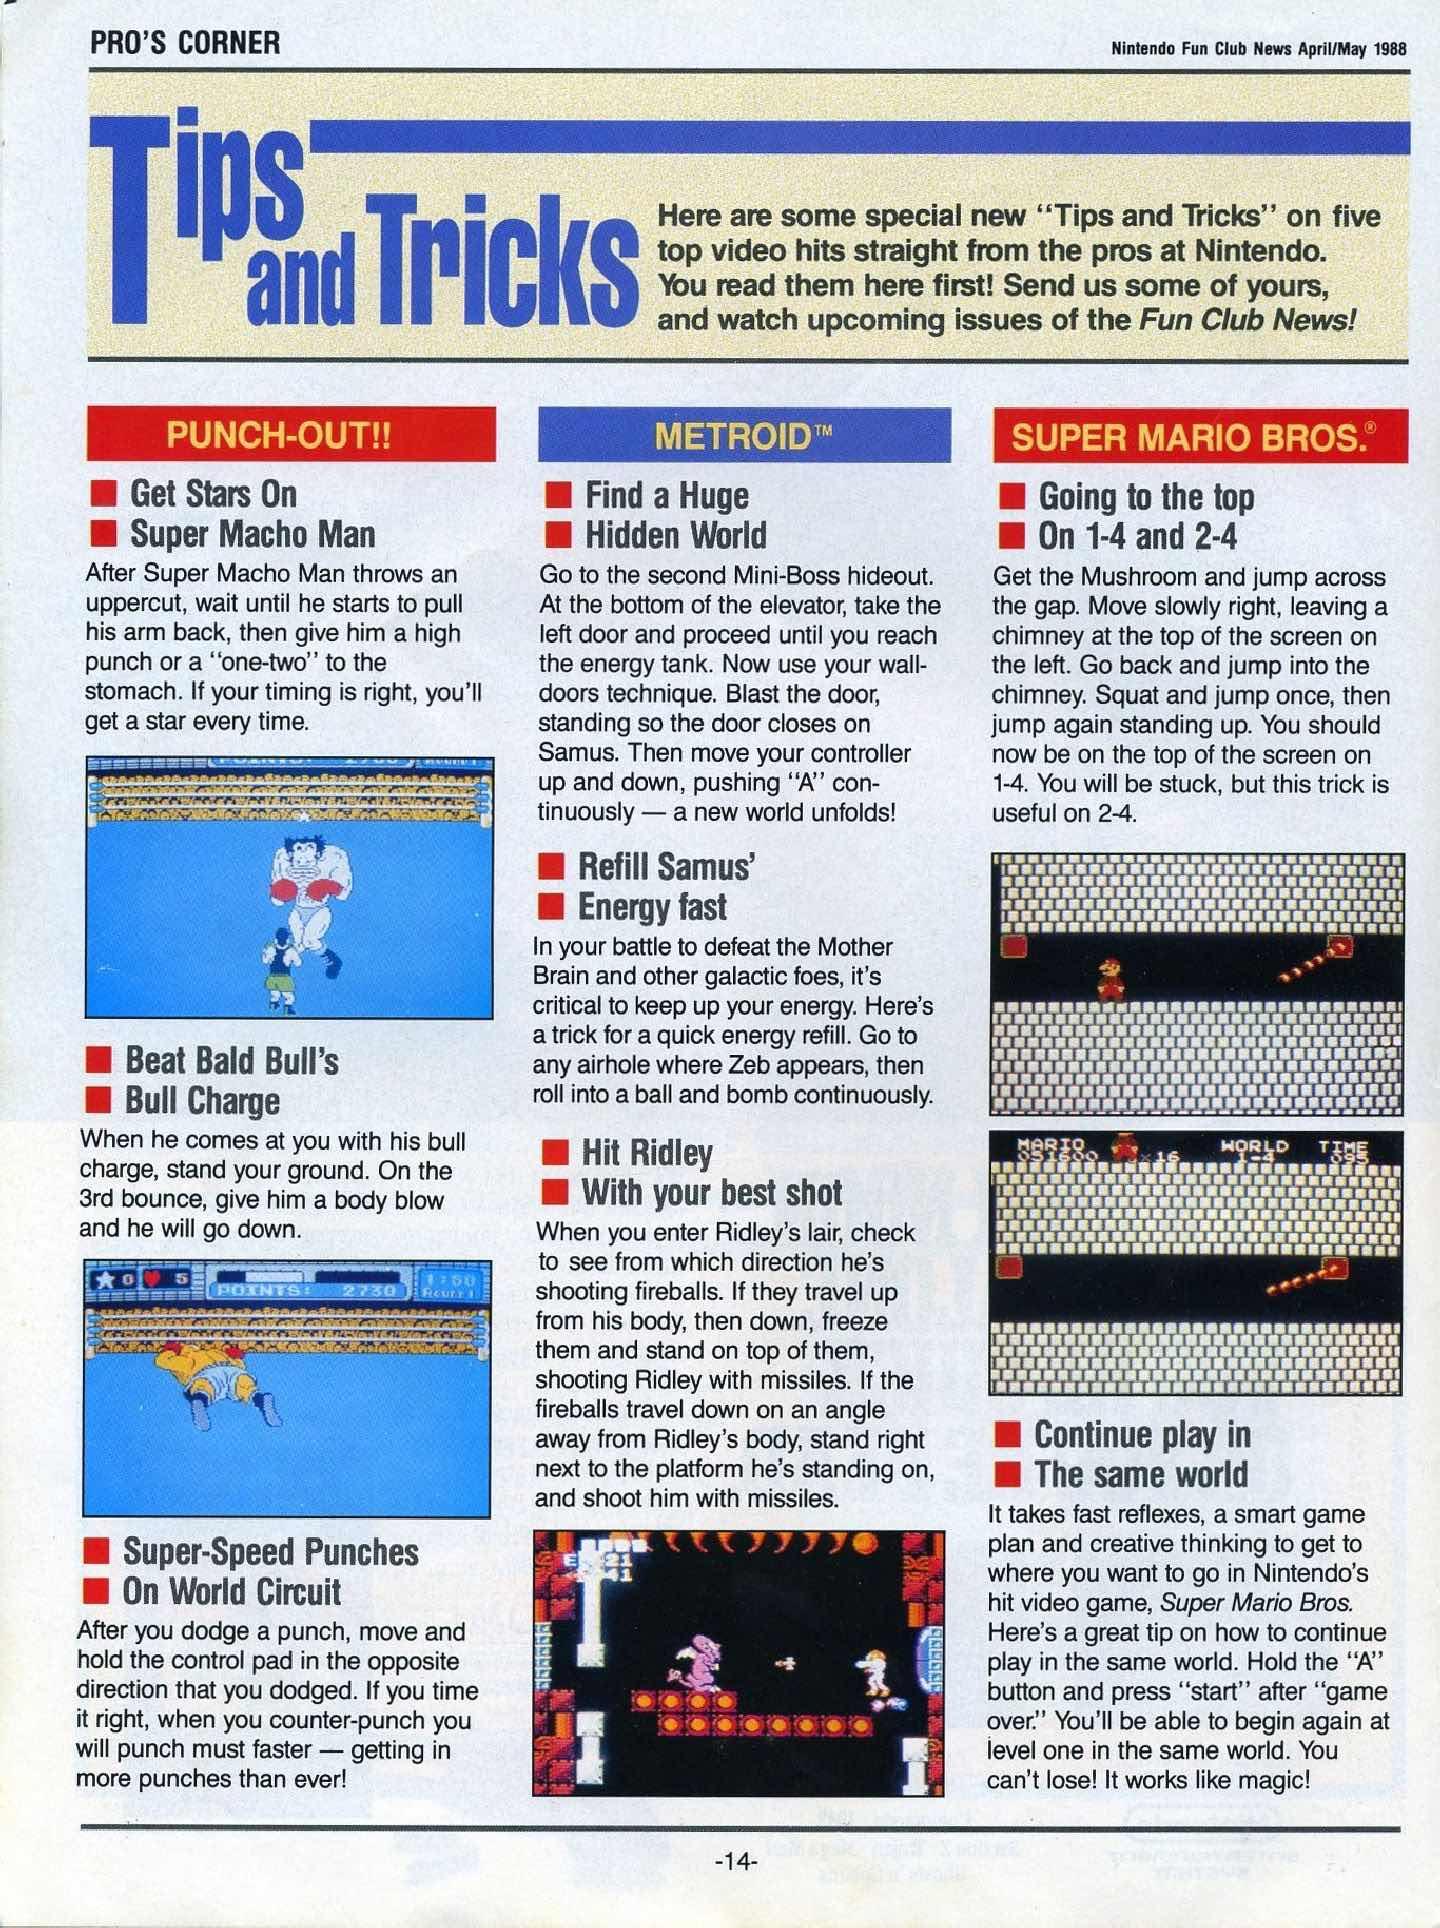 Nintendo Fun Club News April-May 1988 pg14